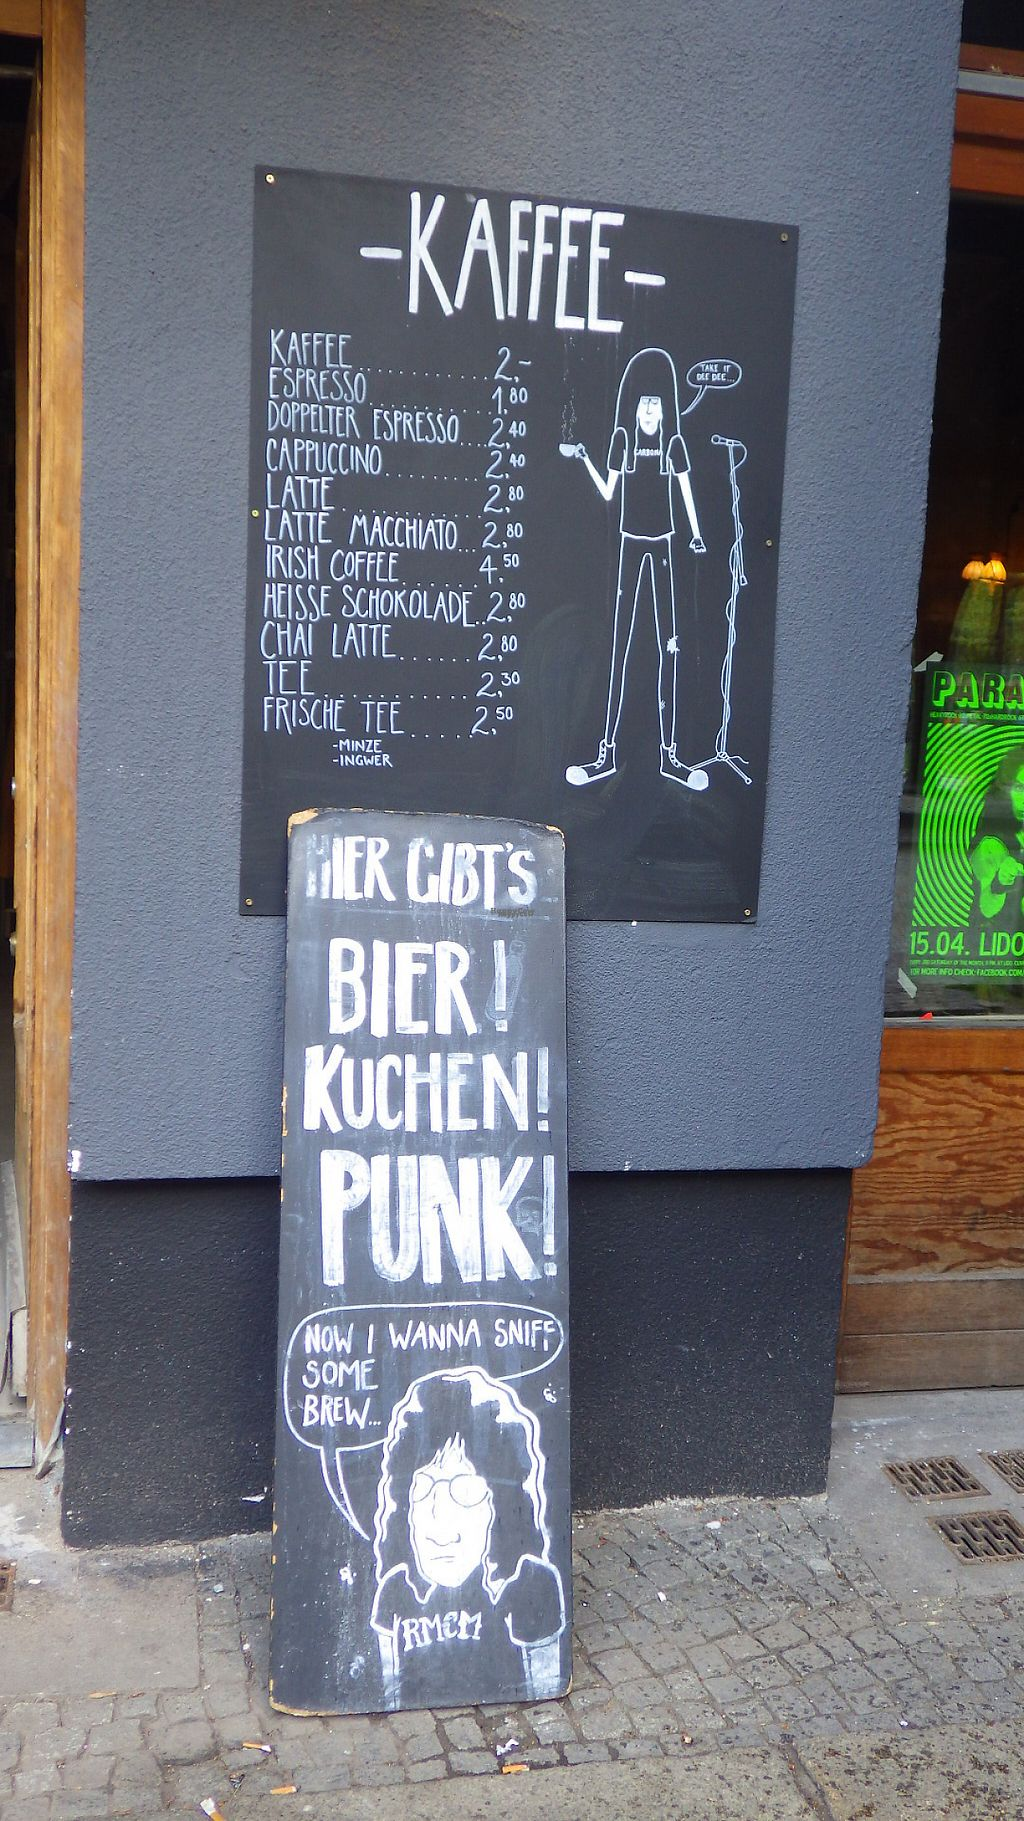 "Photo of Ramones Museum Berlin  by <a href=""/members/profile/deadpledge"">deadpledge</a> <br/>Coffee menu <br/> April 22, 2017  - <a href='/contact/abuse/image/56423/250887'>Report</a>"